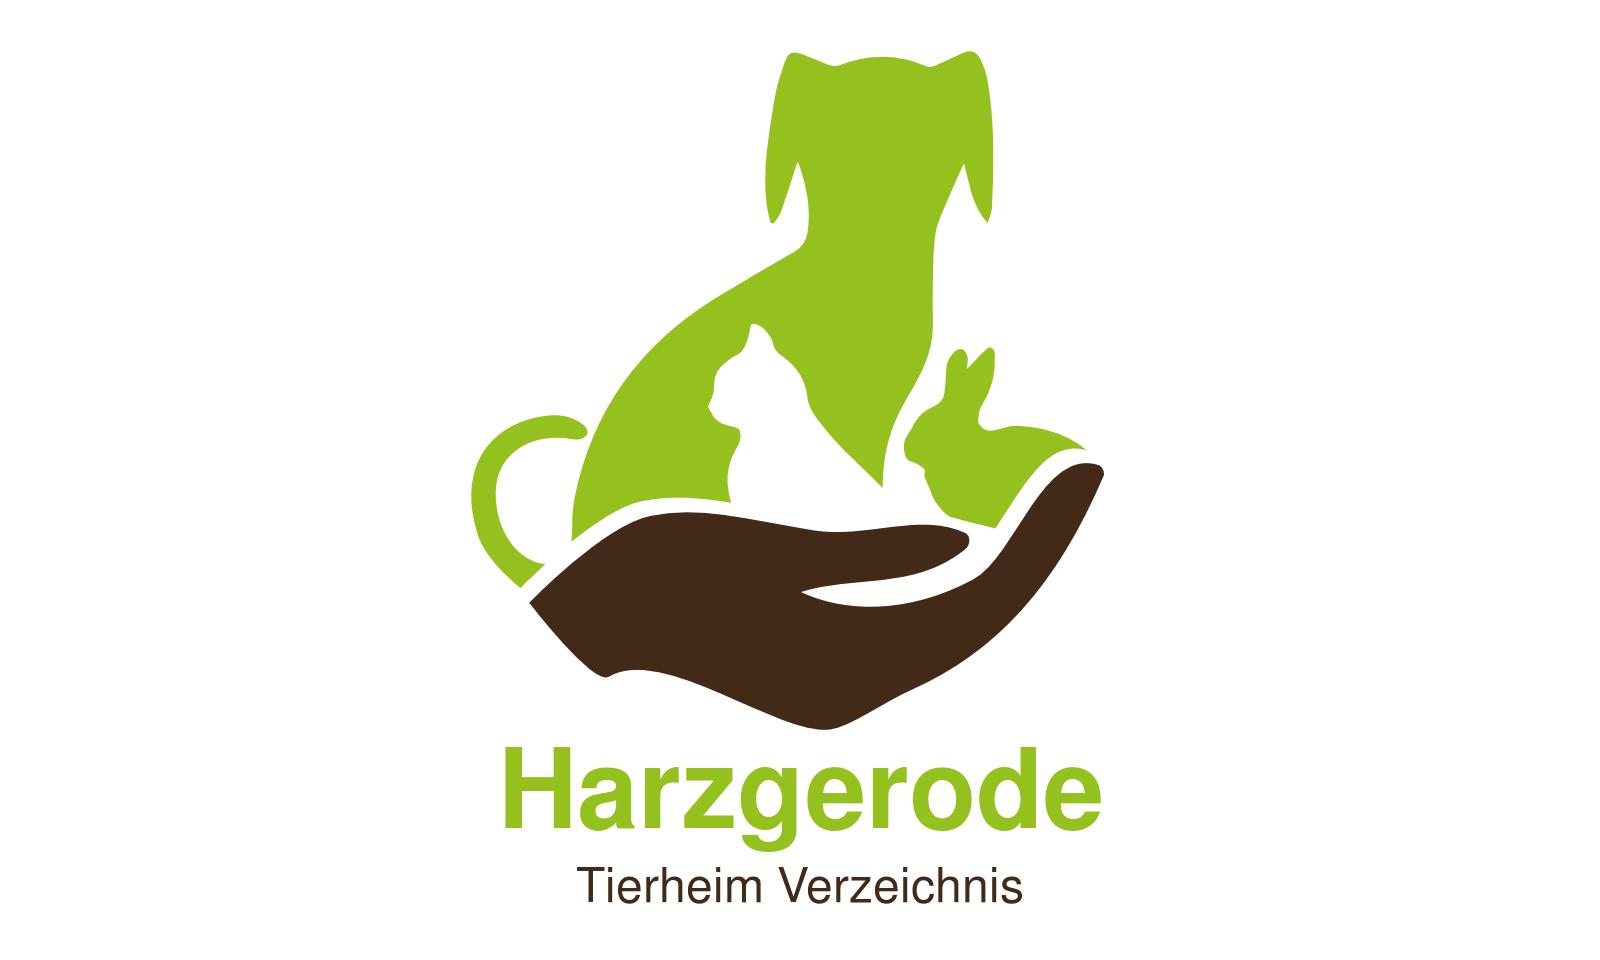 Tierheim Harzgerode